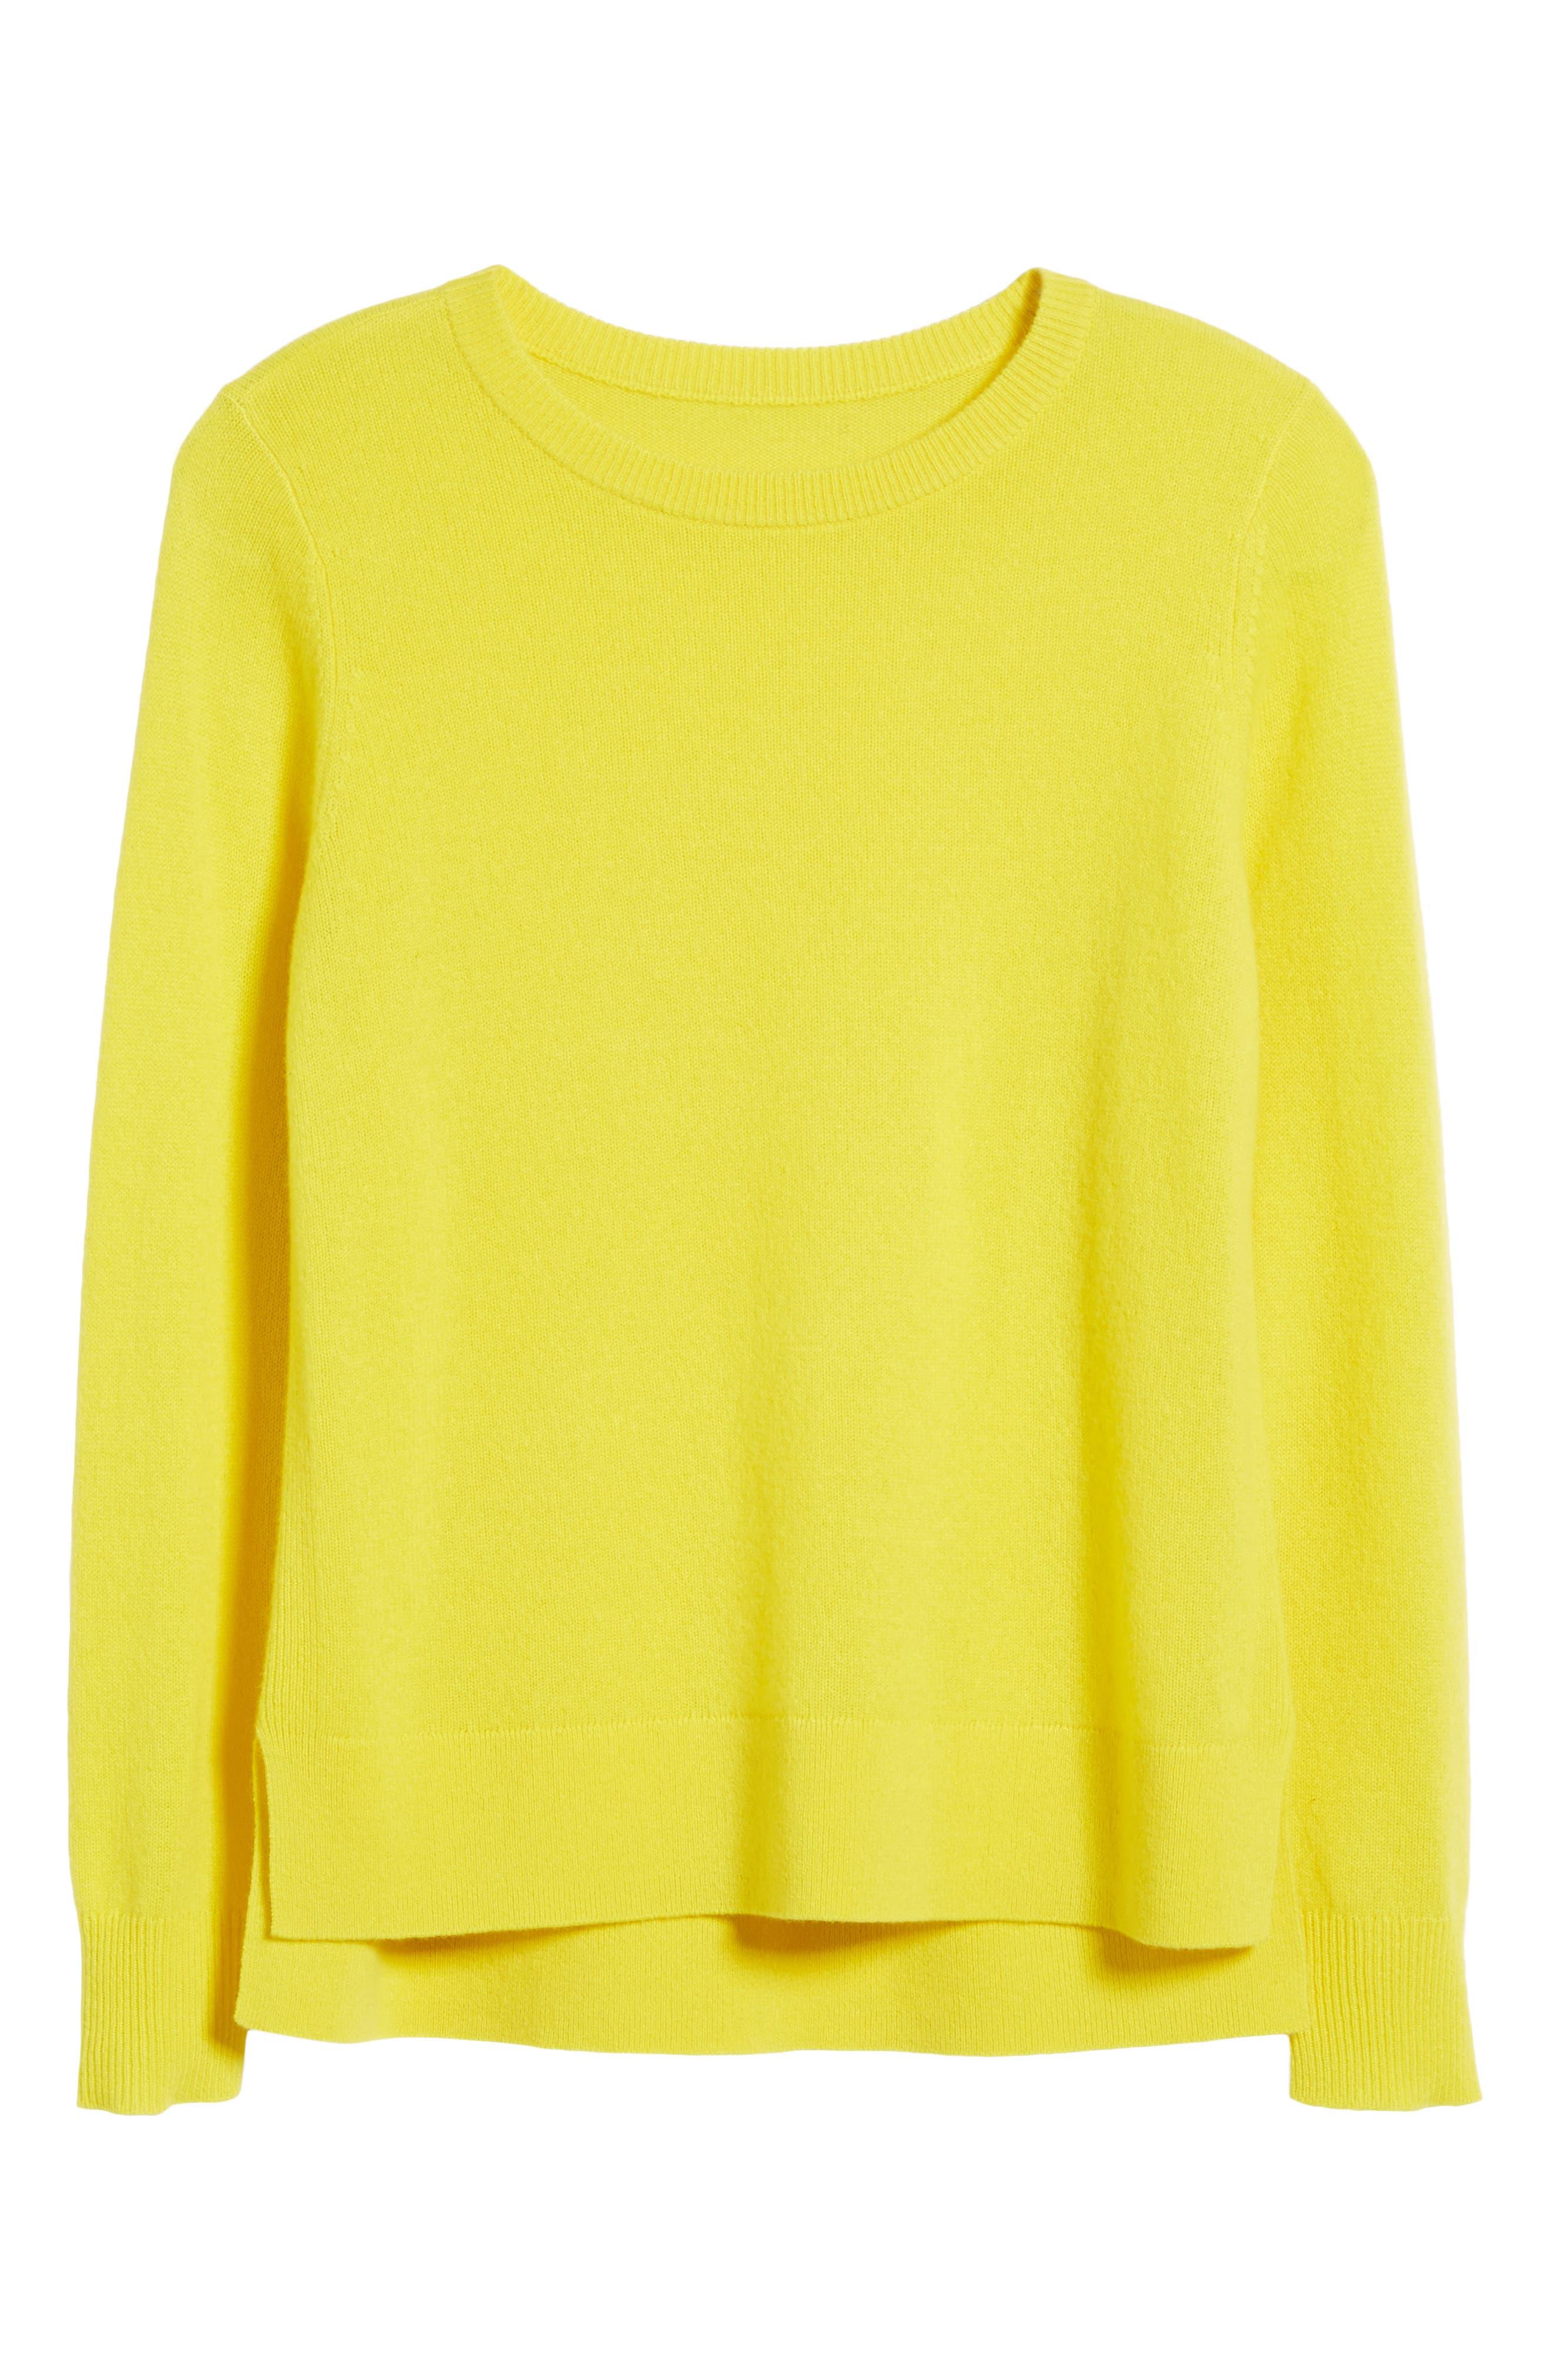 Crewneck Cashmere Sweater,                             Alternate thumbnail 7, color,                             Blazing Buttercup